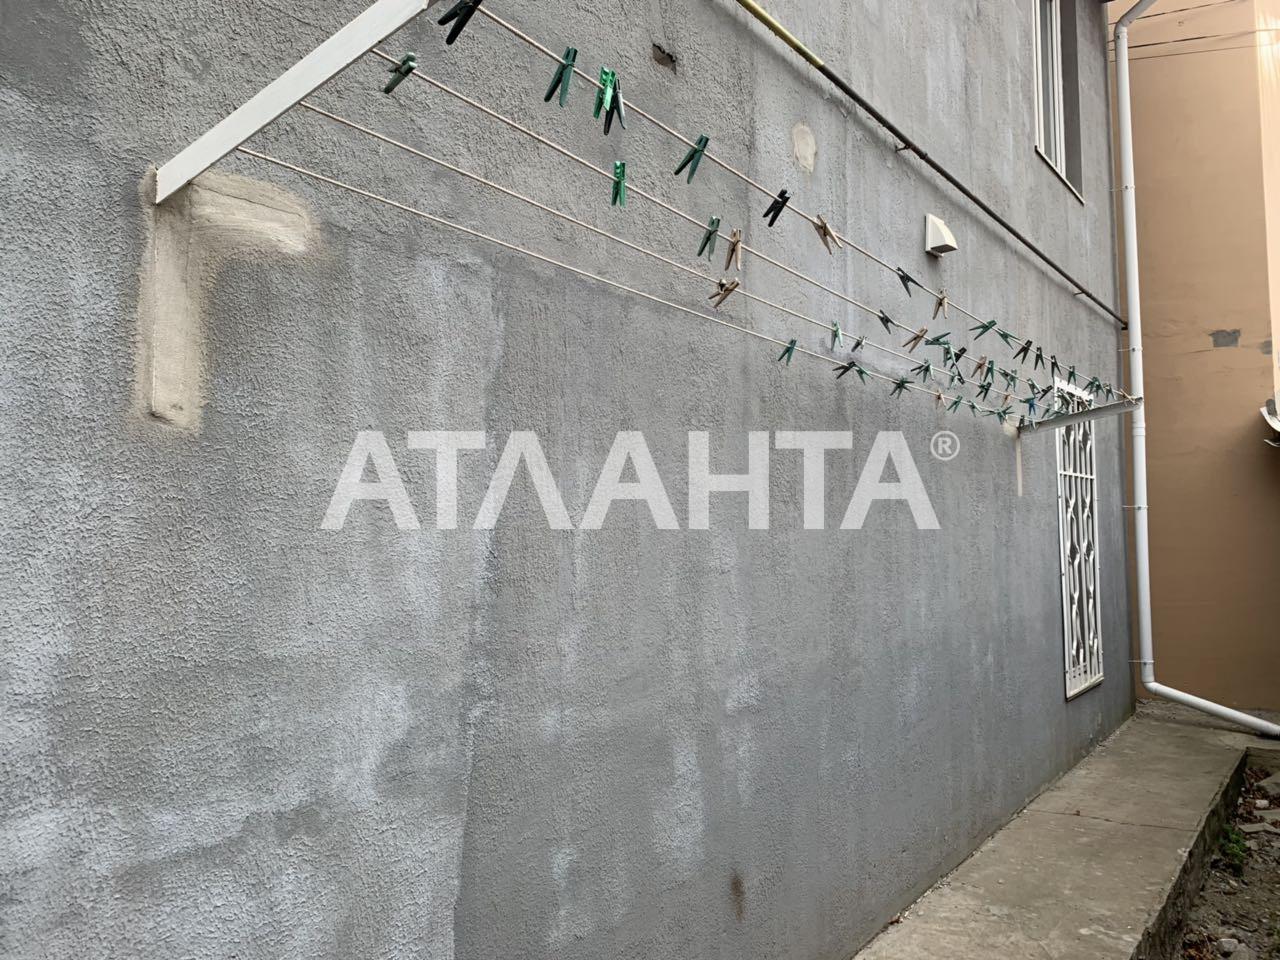 Продается 1-комнатная Квартира на ул. Балтская Дор. — 20 000 у.е. (фото №13)